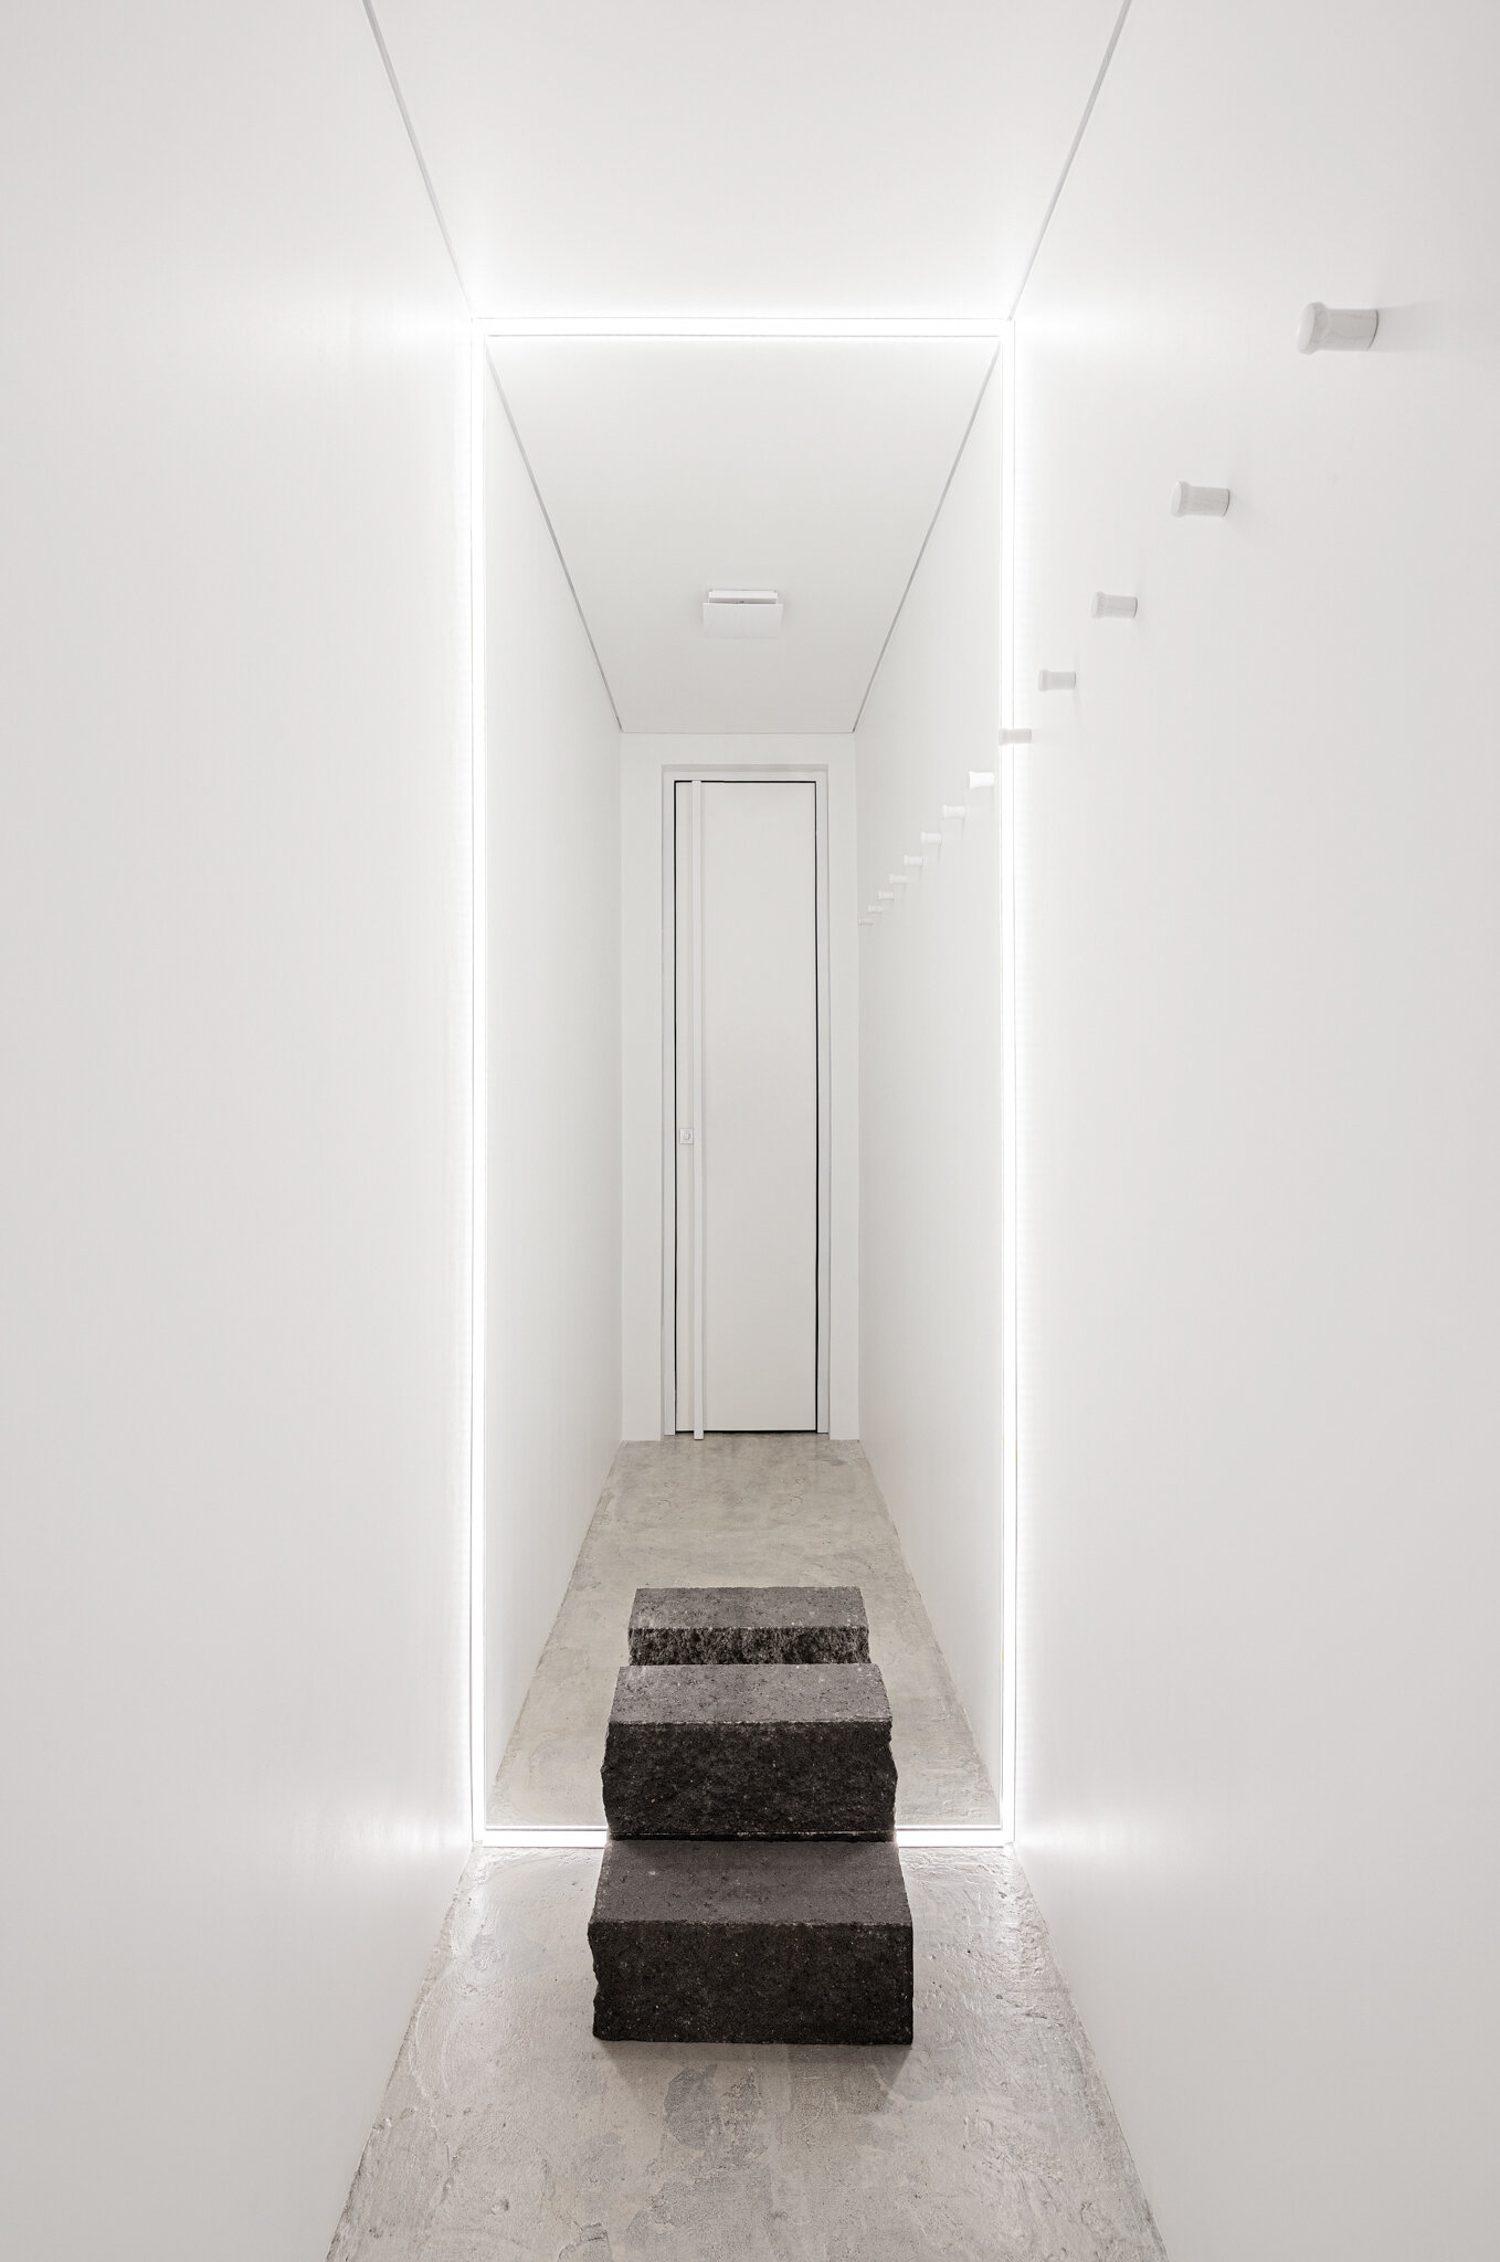 Flooring is rough-troweled concrete. Photography by Yevhenii Avramenko and Nata Kurylenko.